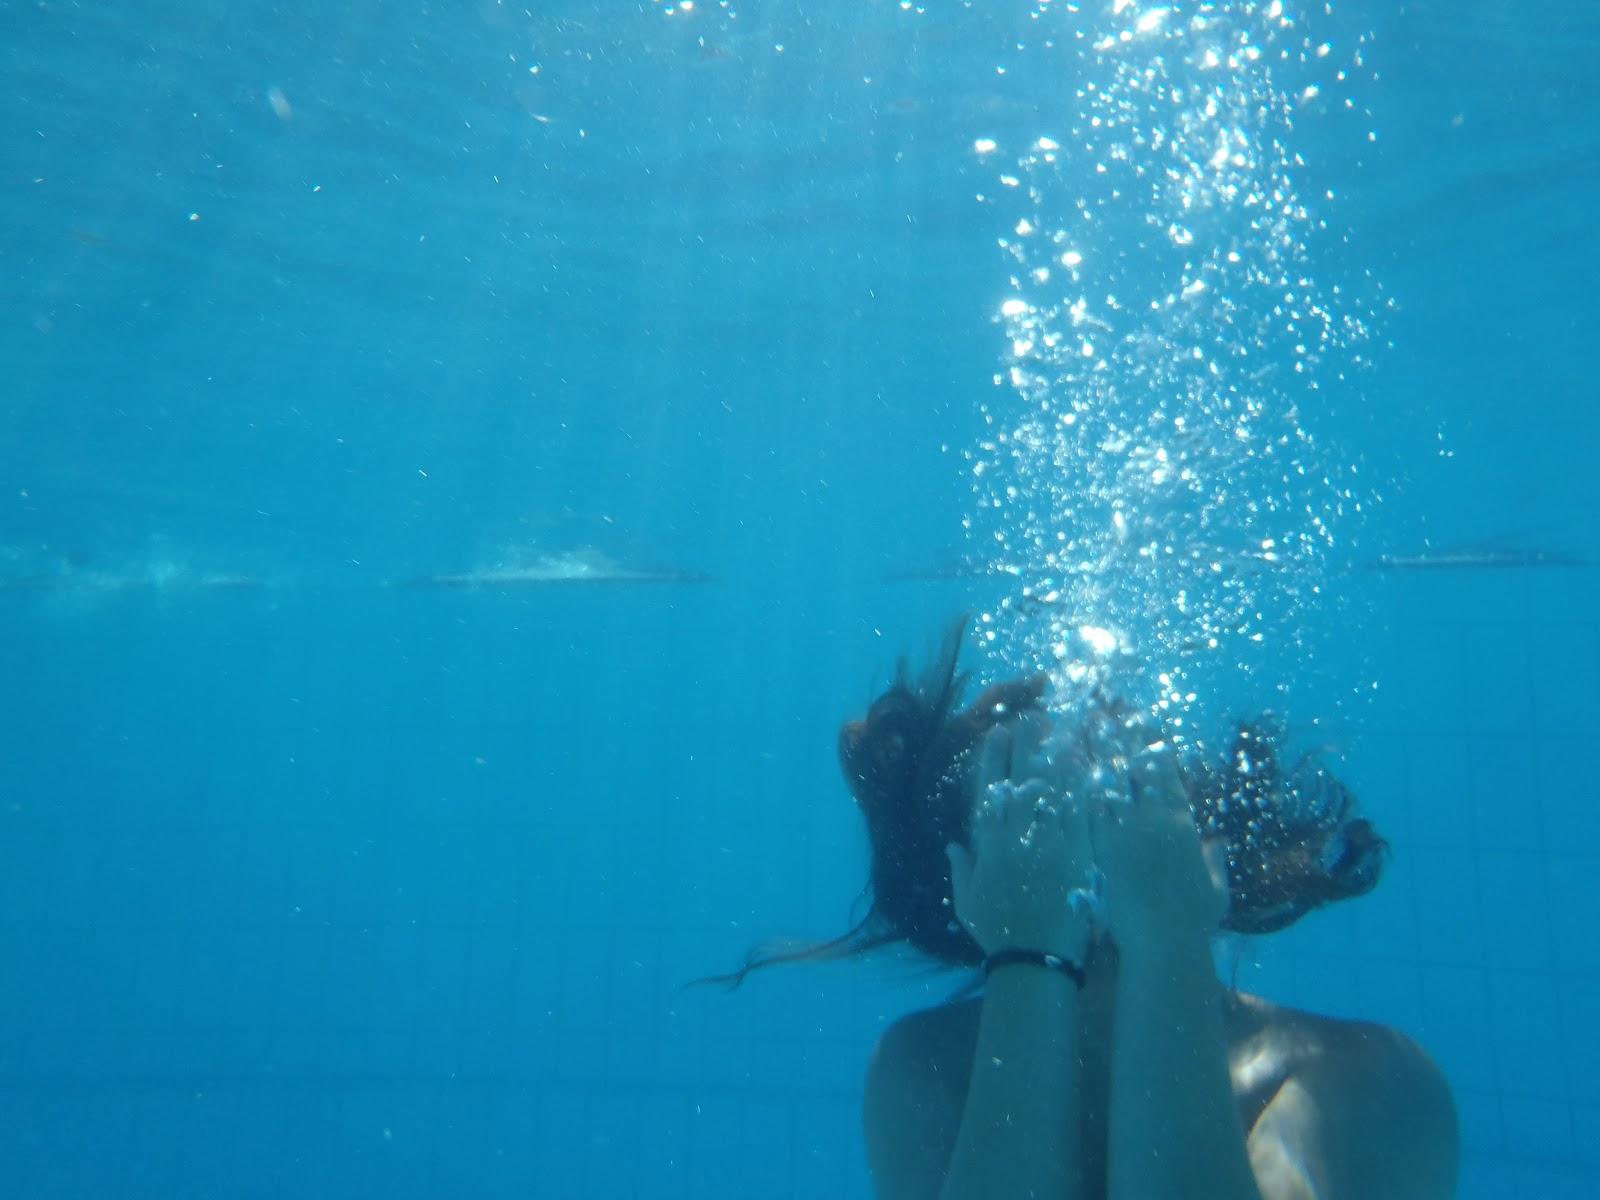 N jera javi manzanares bajo el agua de la piscina for Agua de la piscina turbia